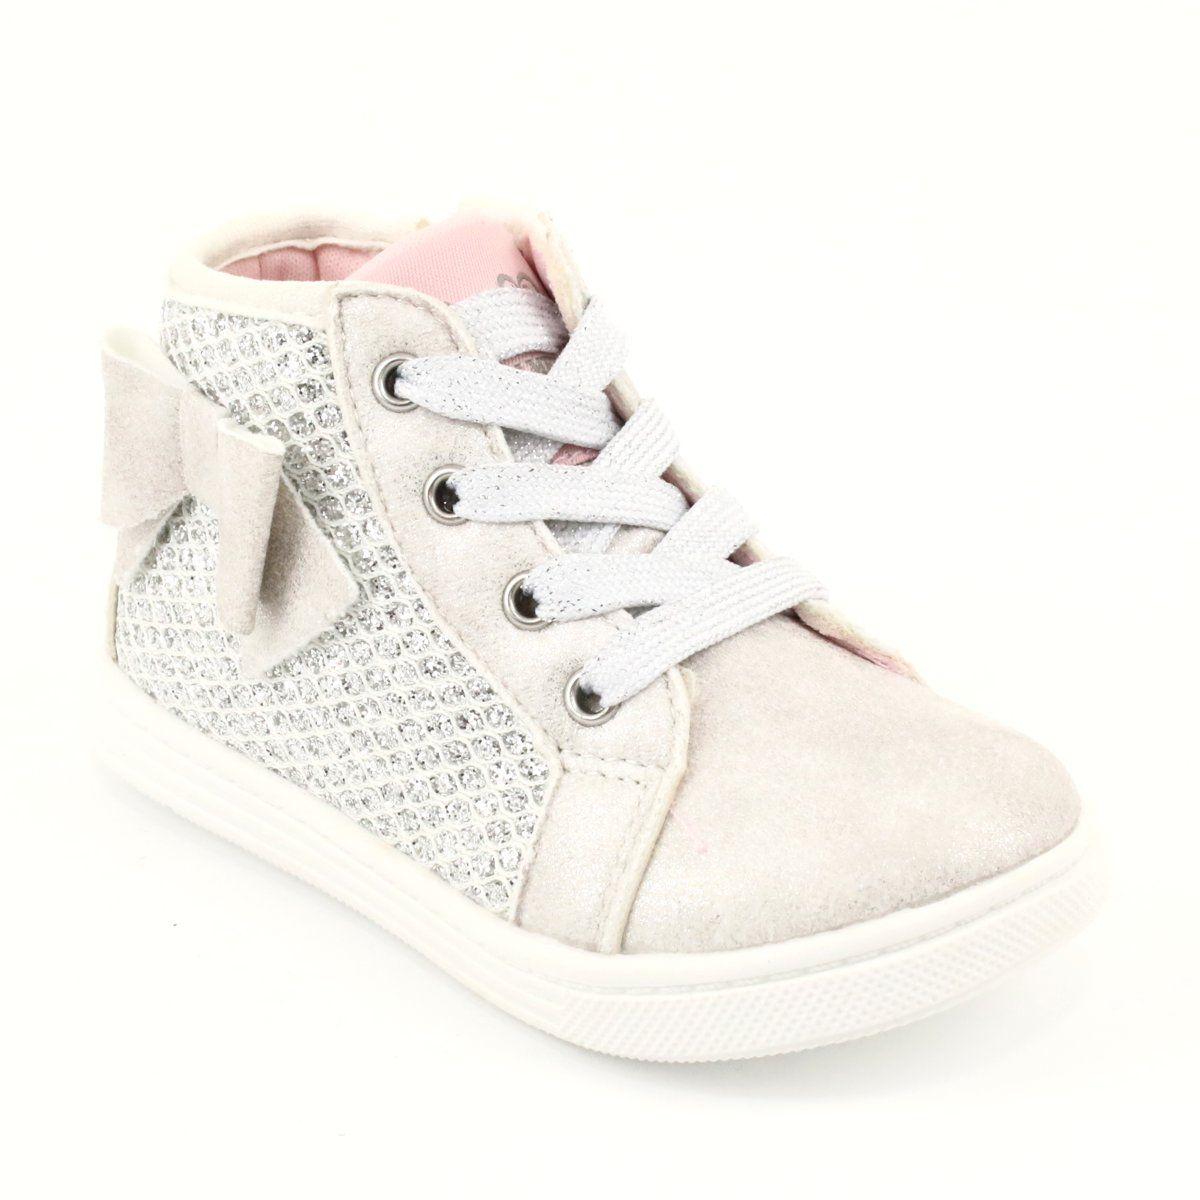 Trzewiki Sportowe Dziewczece American Club Gc17 Biale Szare Wedge Sneaker Shoes High Top Sneakers